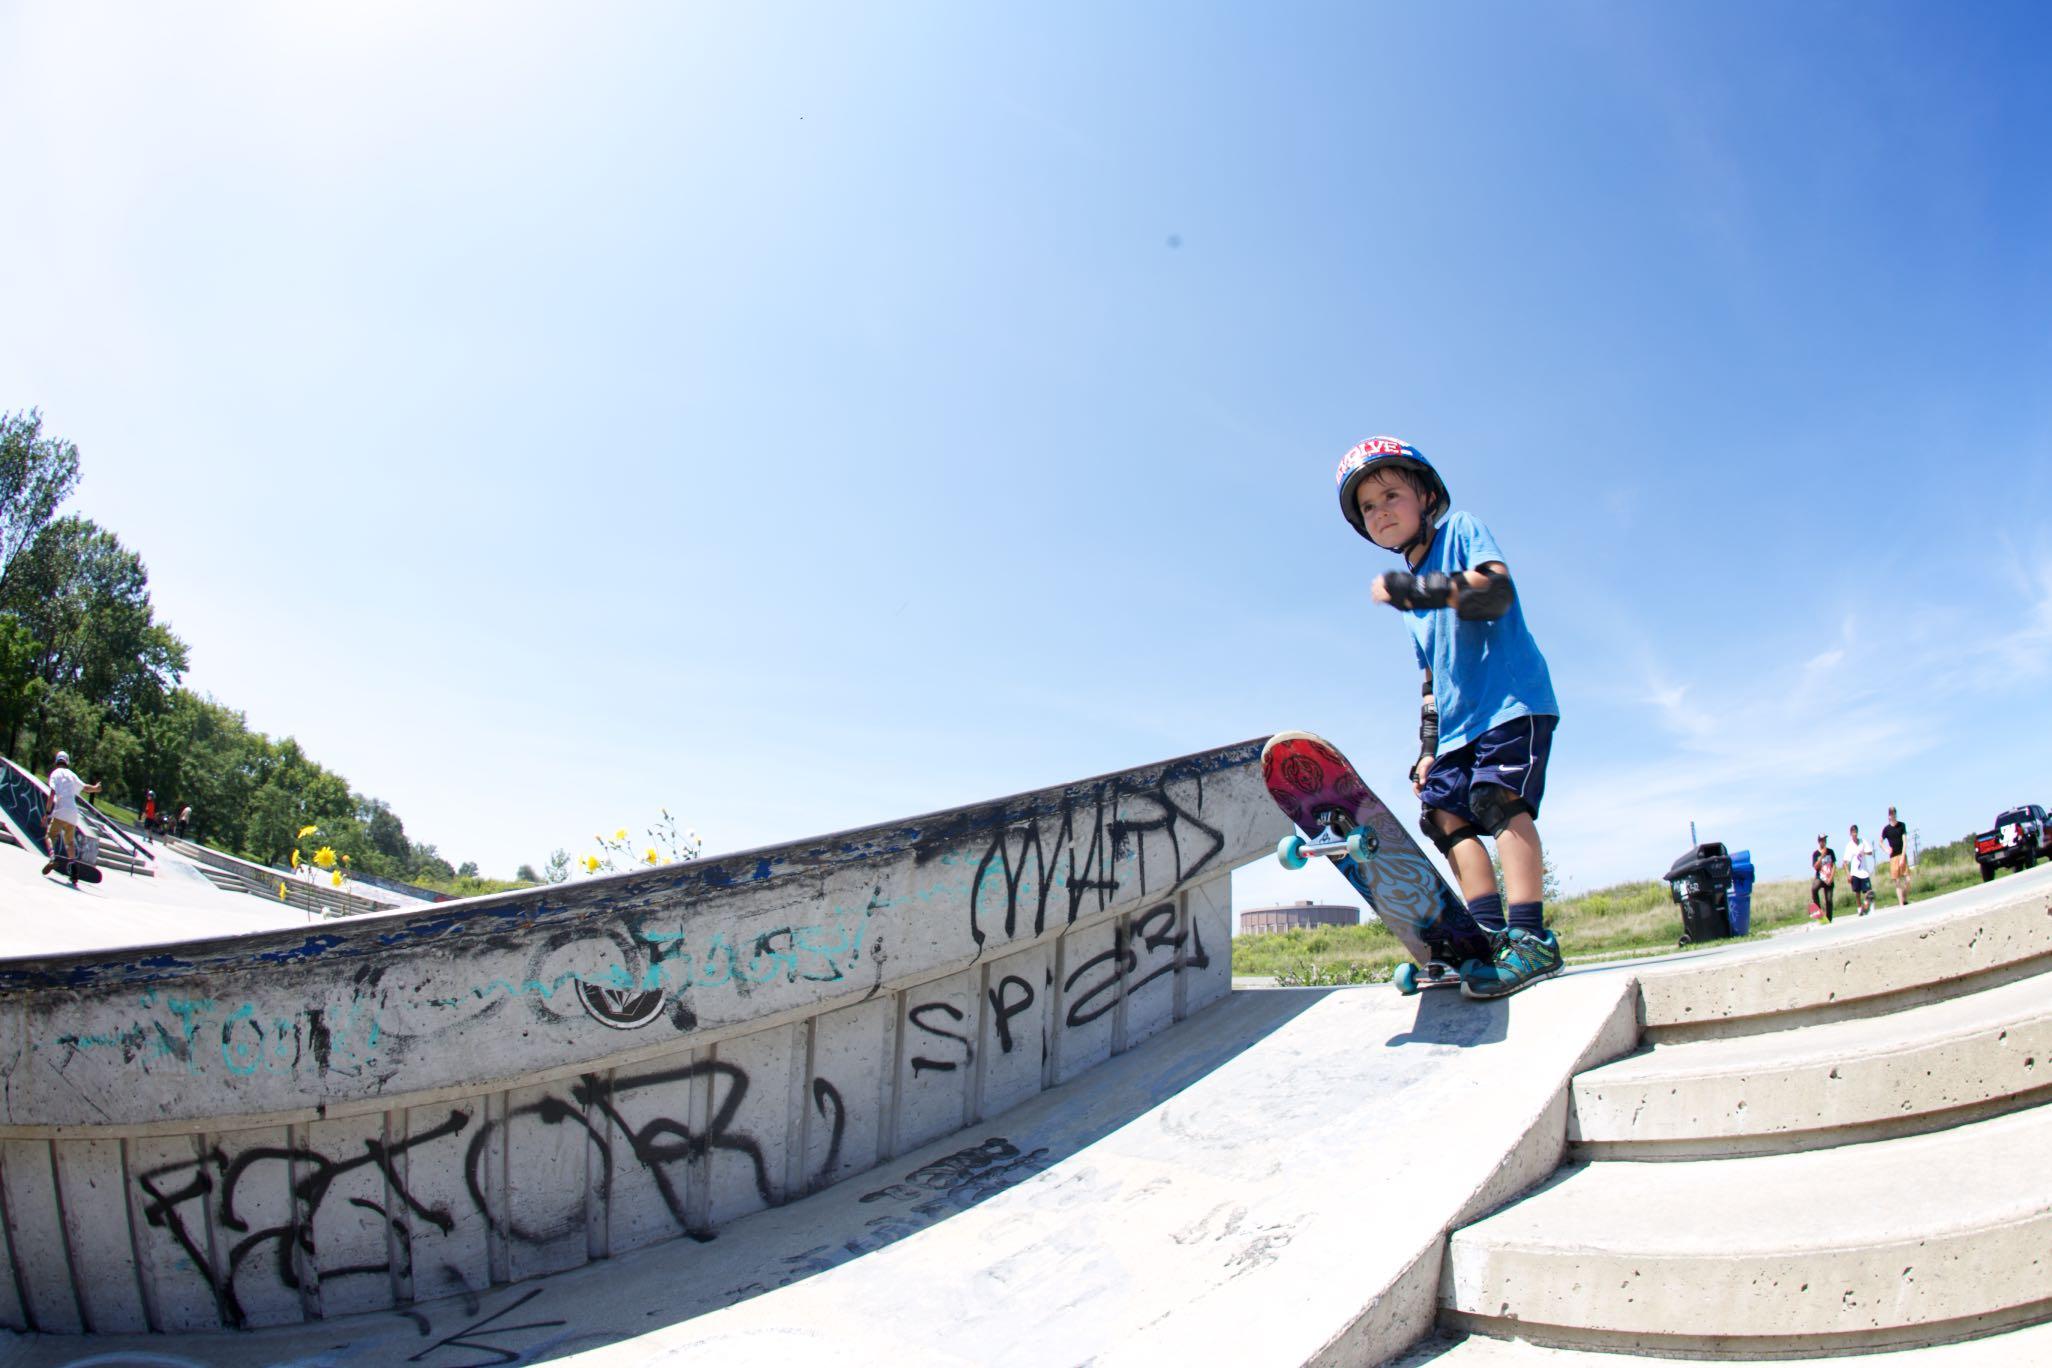 Whistler Skateboard Shop